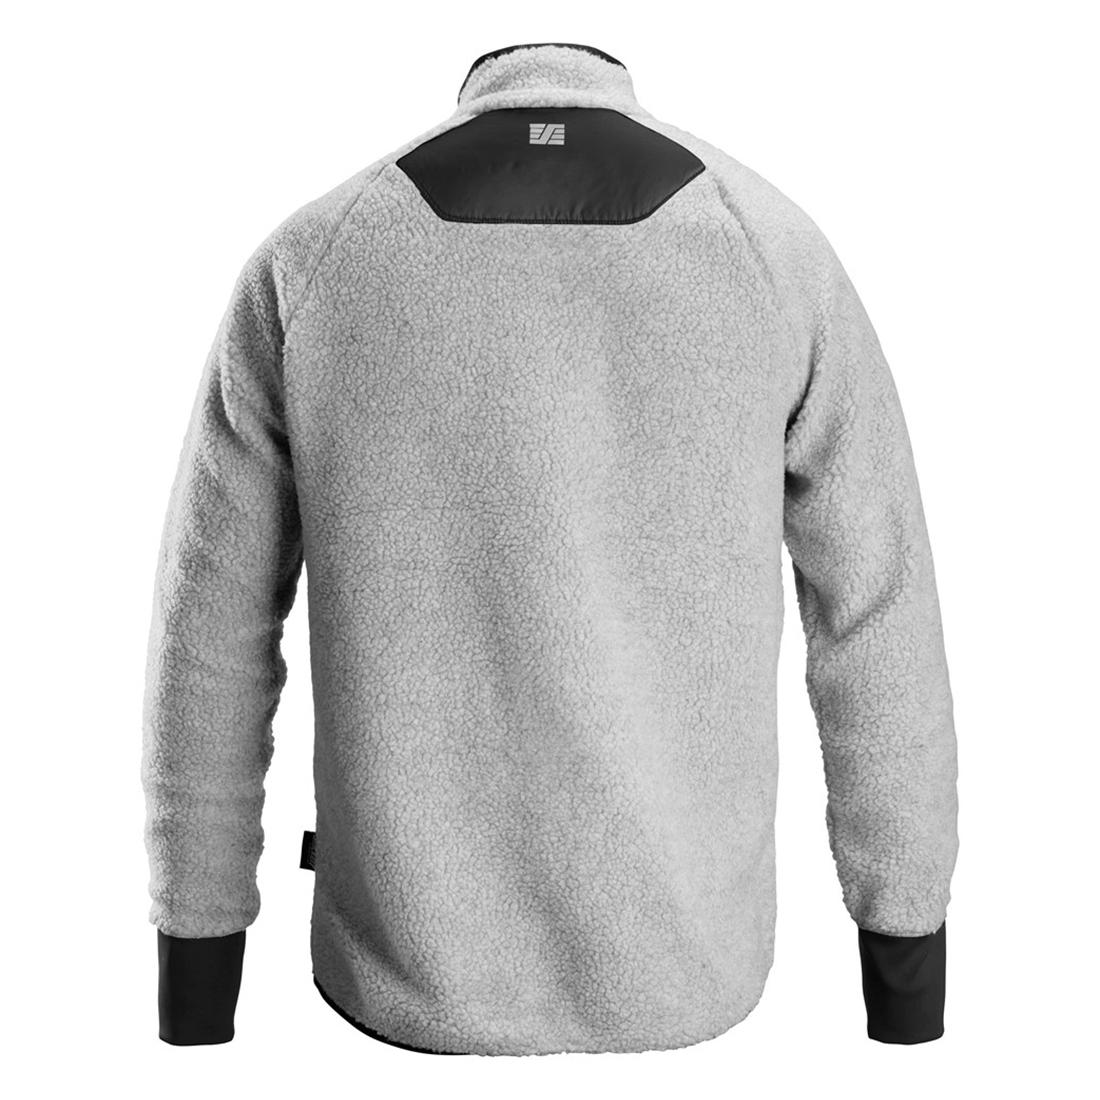 Snickers Workwear AllroundWork, Pile Full Zip Jacket Grå 8021